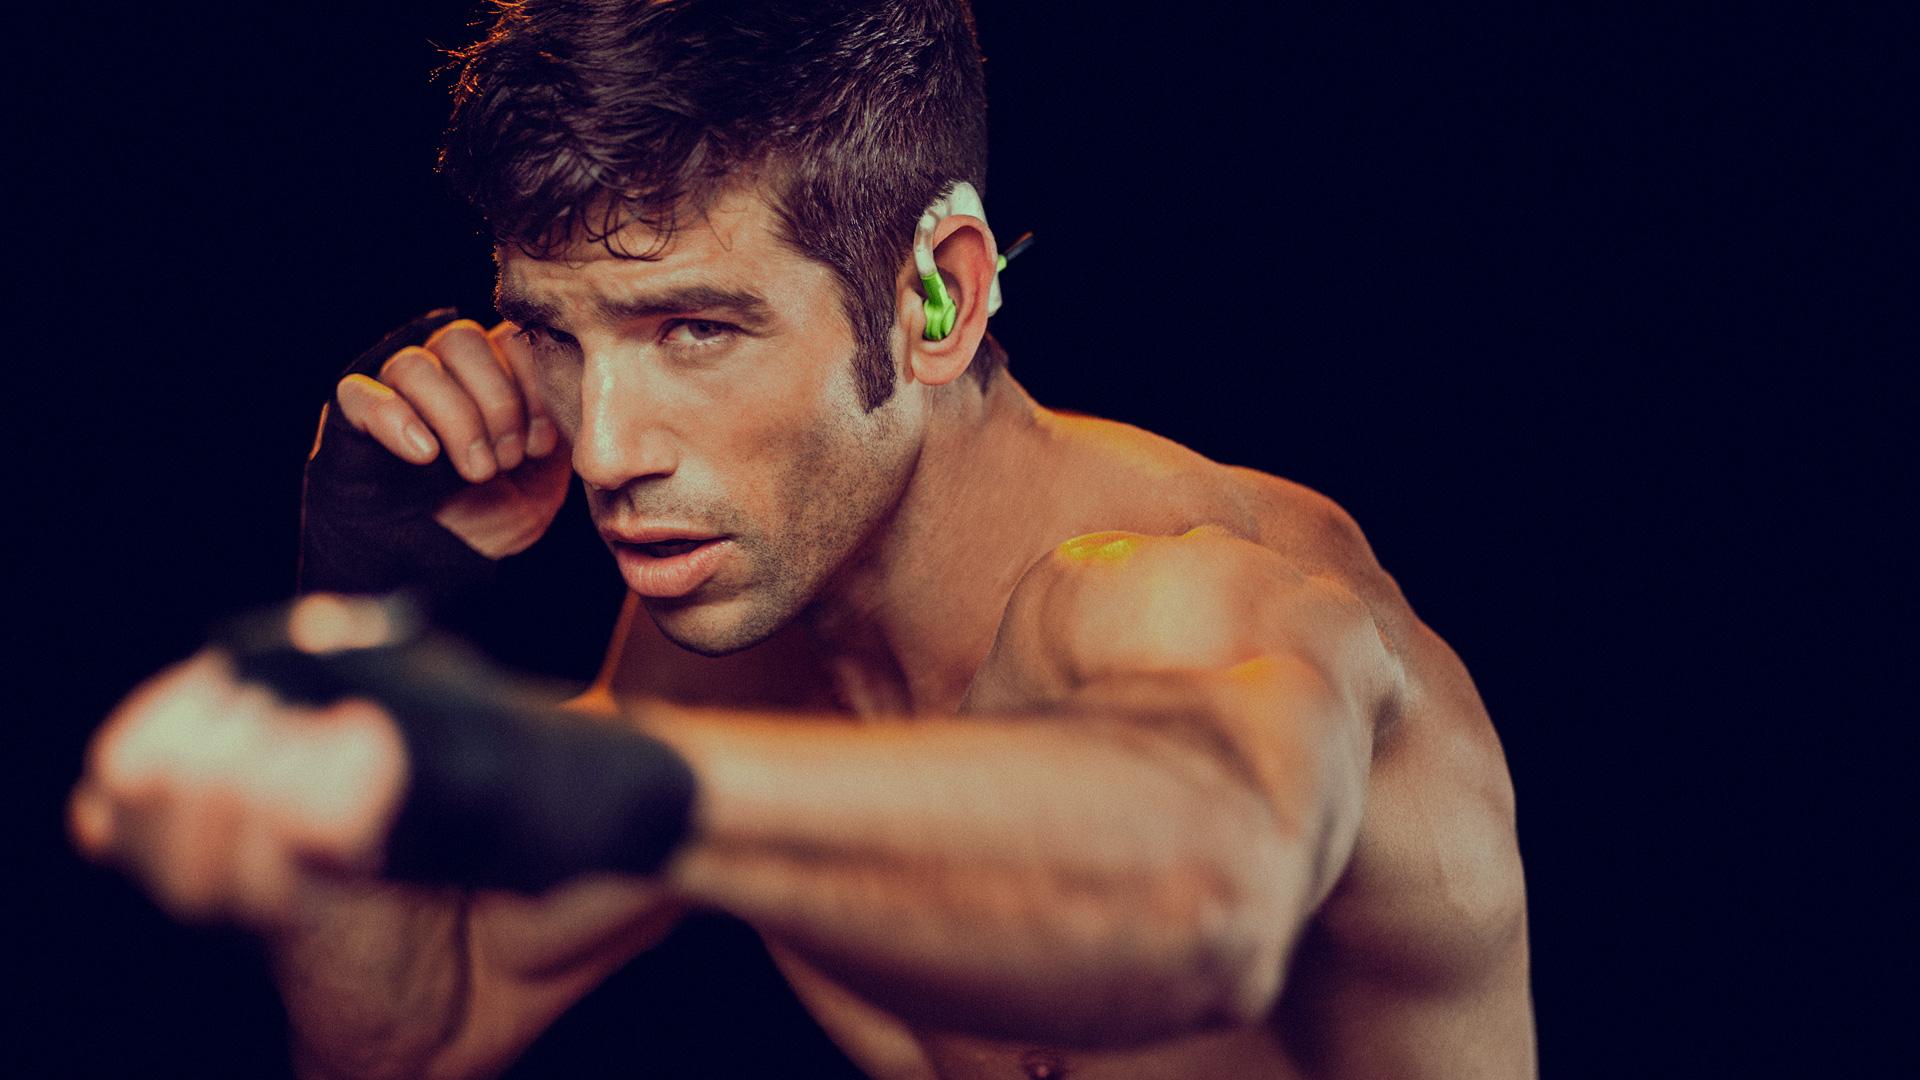 blueant wireless pump hd male boxer